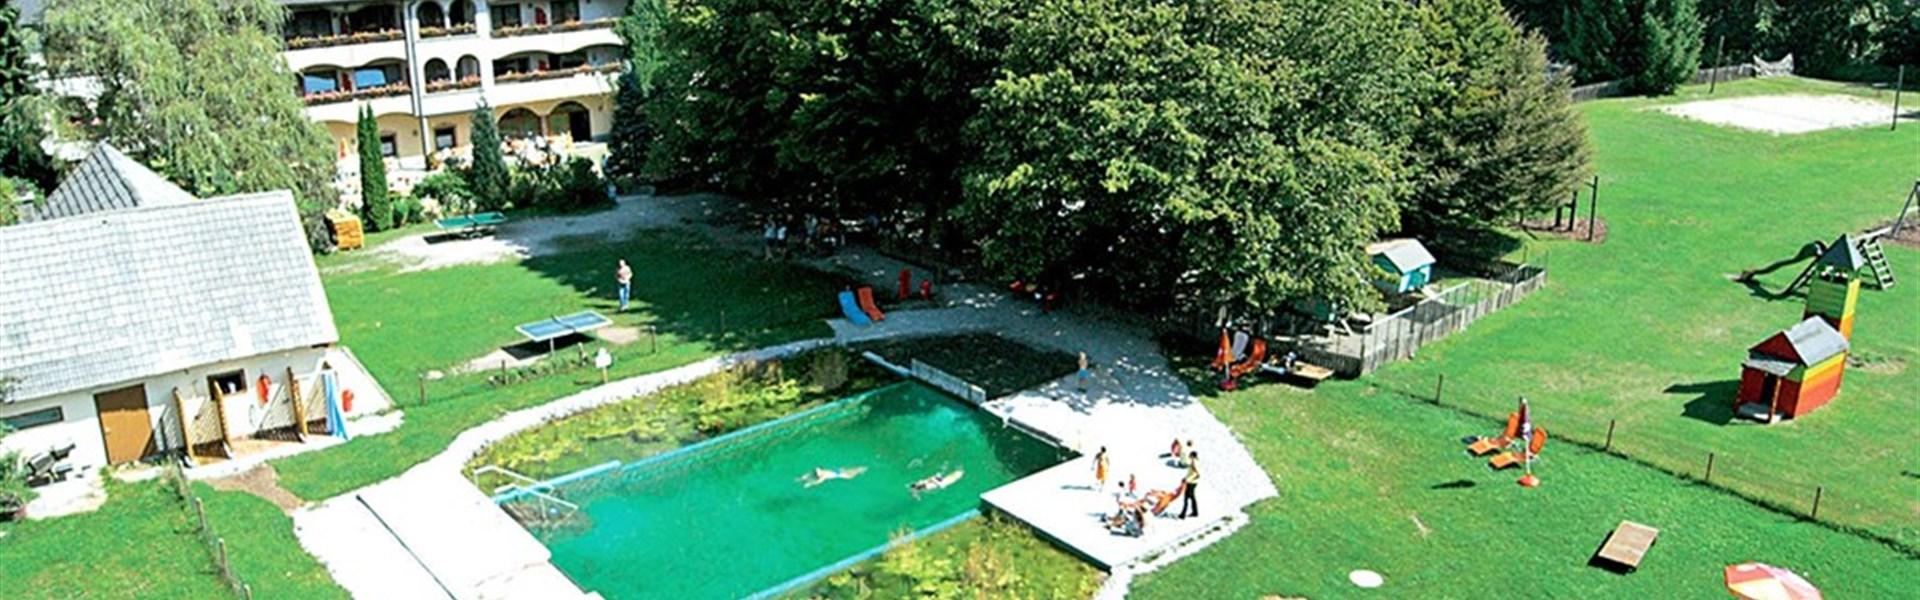 Marco Polo - Familienpark Mittagskogel -